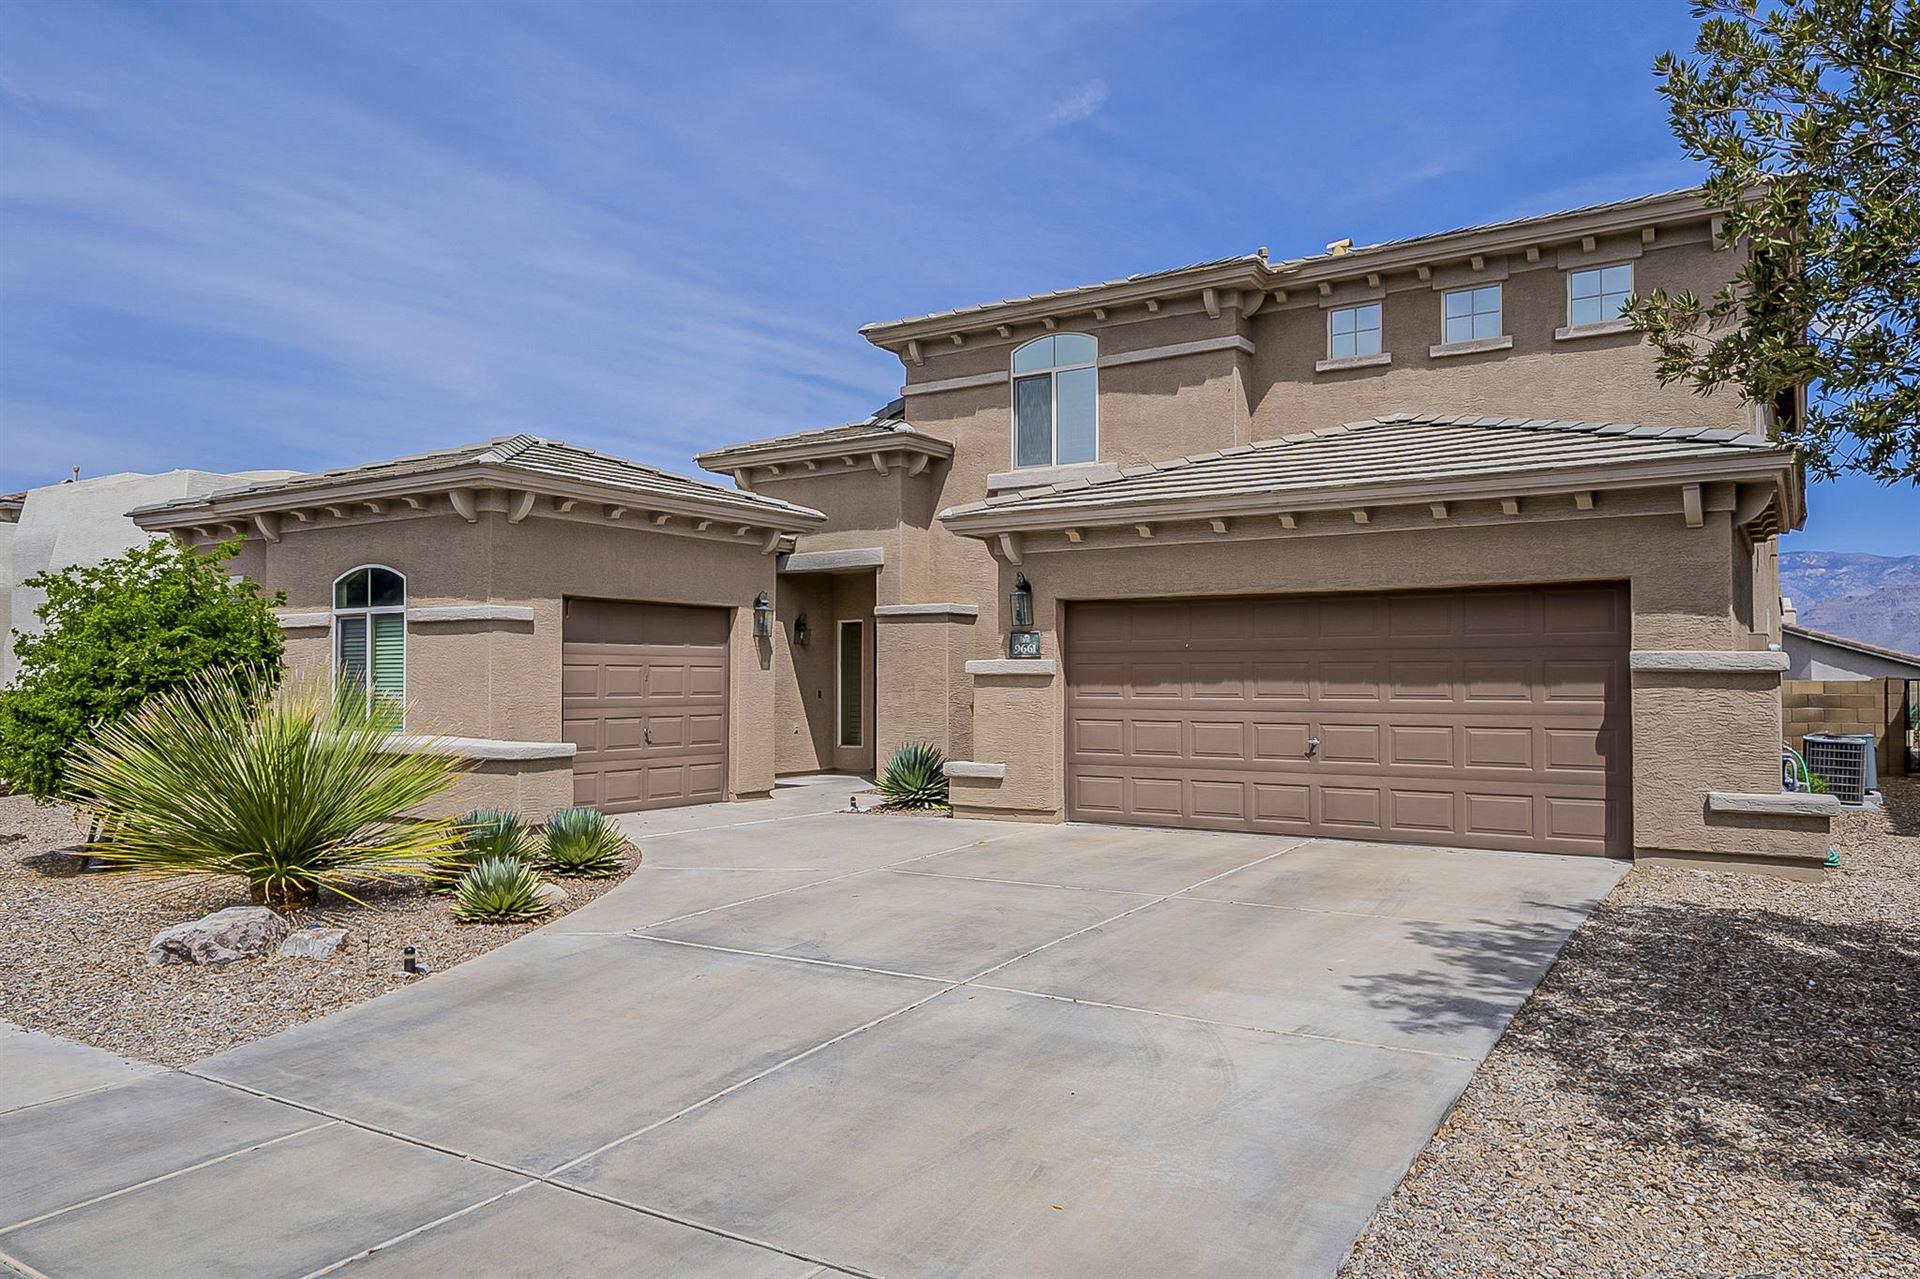 9661 E Via Del Sol Feliz, Tucson, AZ 85748 - MLS#: 22109923